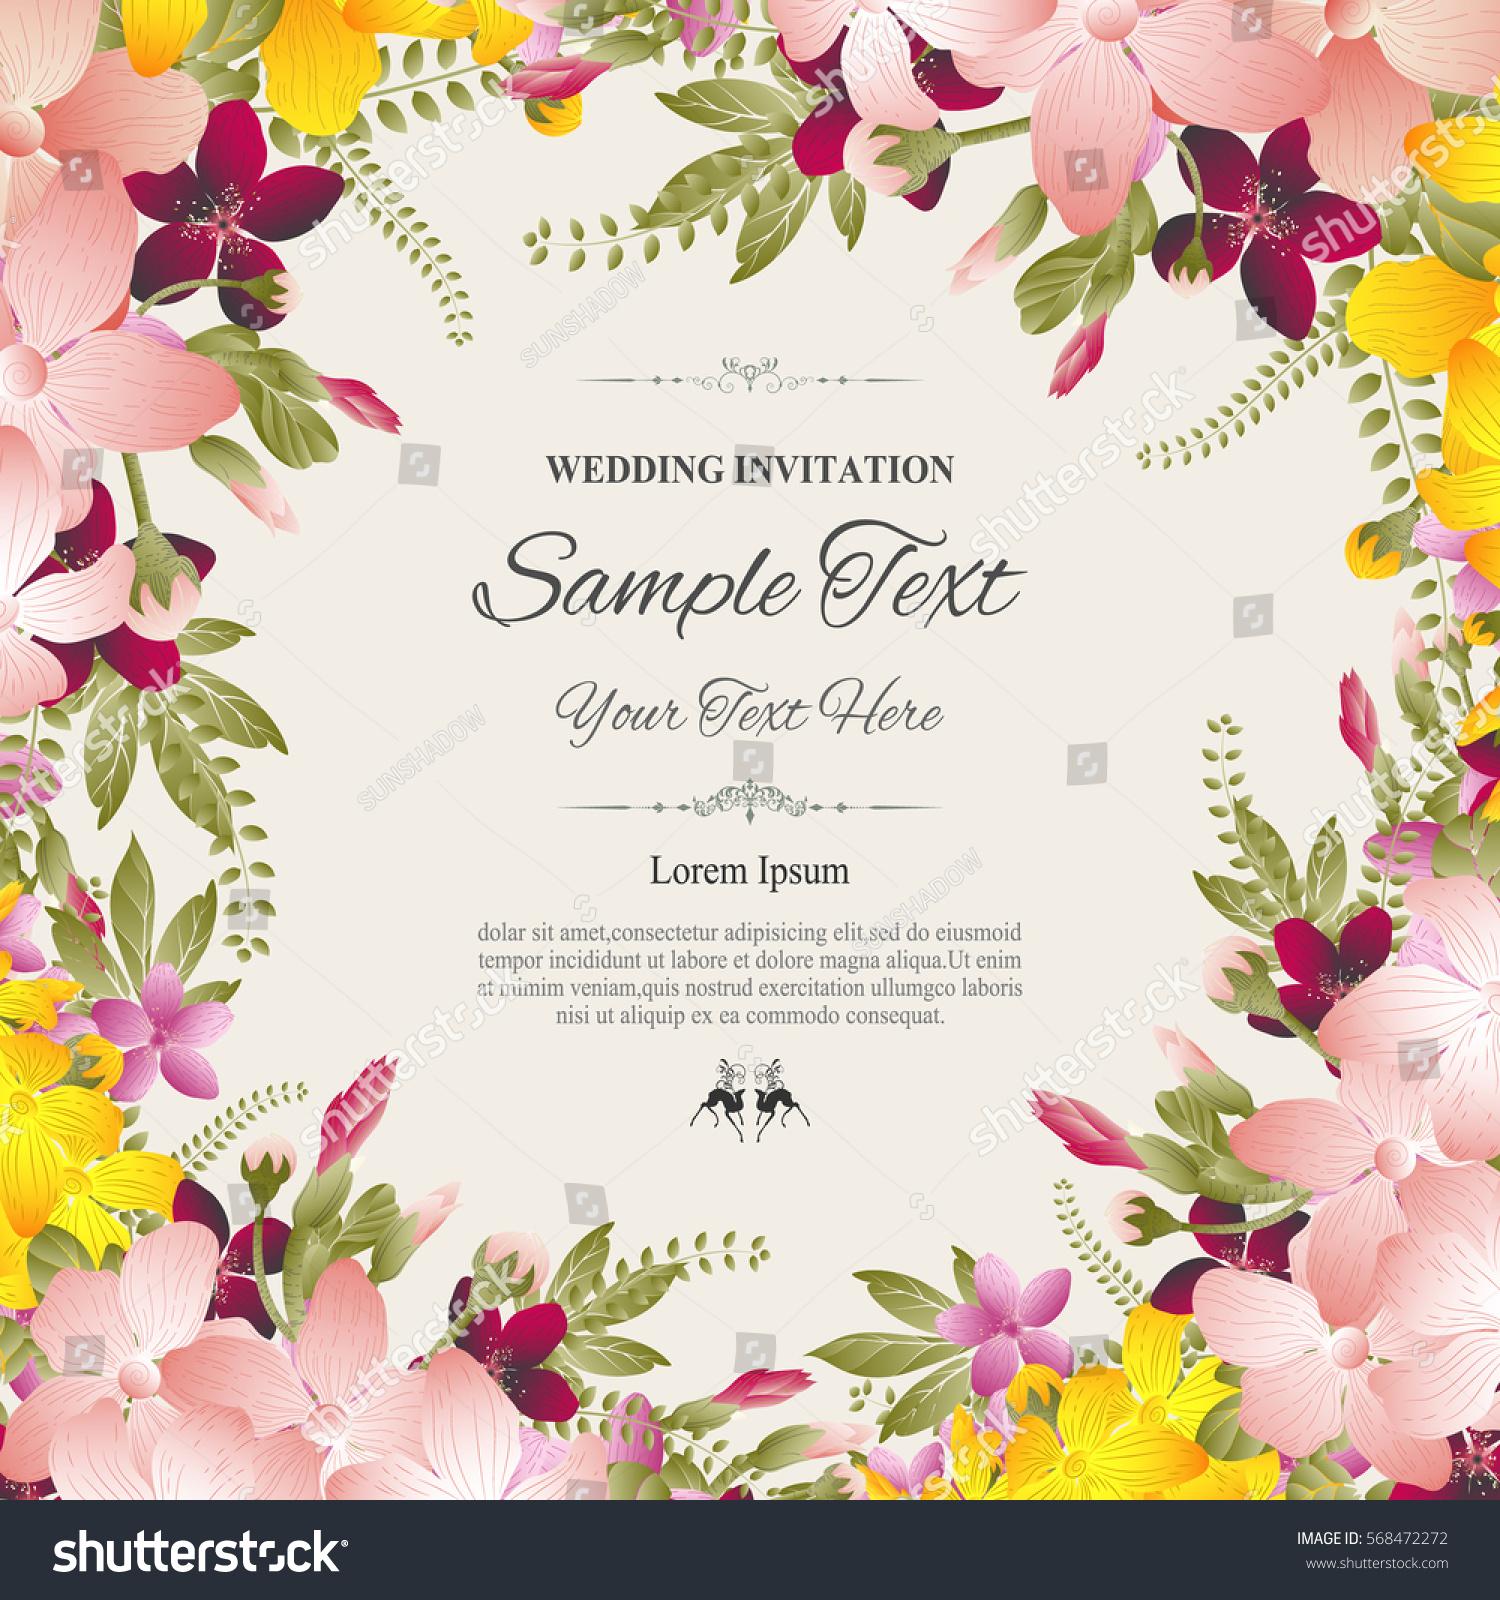 Wedding invitation greeting card abstract floral stock vector wedding invitation or greeting card with abstract floral background vector illustration filmwisefo